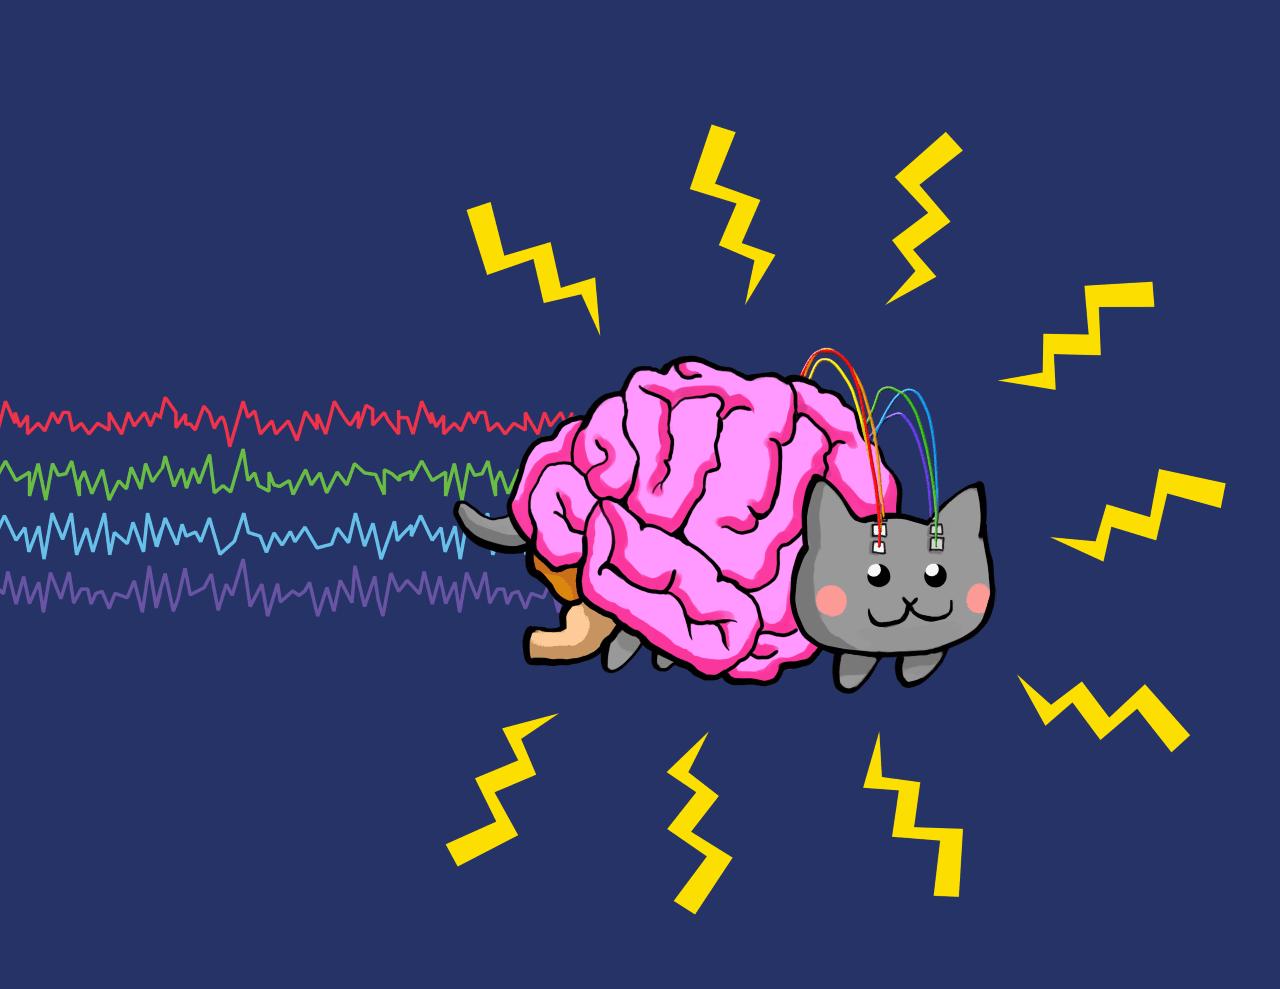 FDA approves seizure cat to yawn, trot away during seizures | GomerBlog